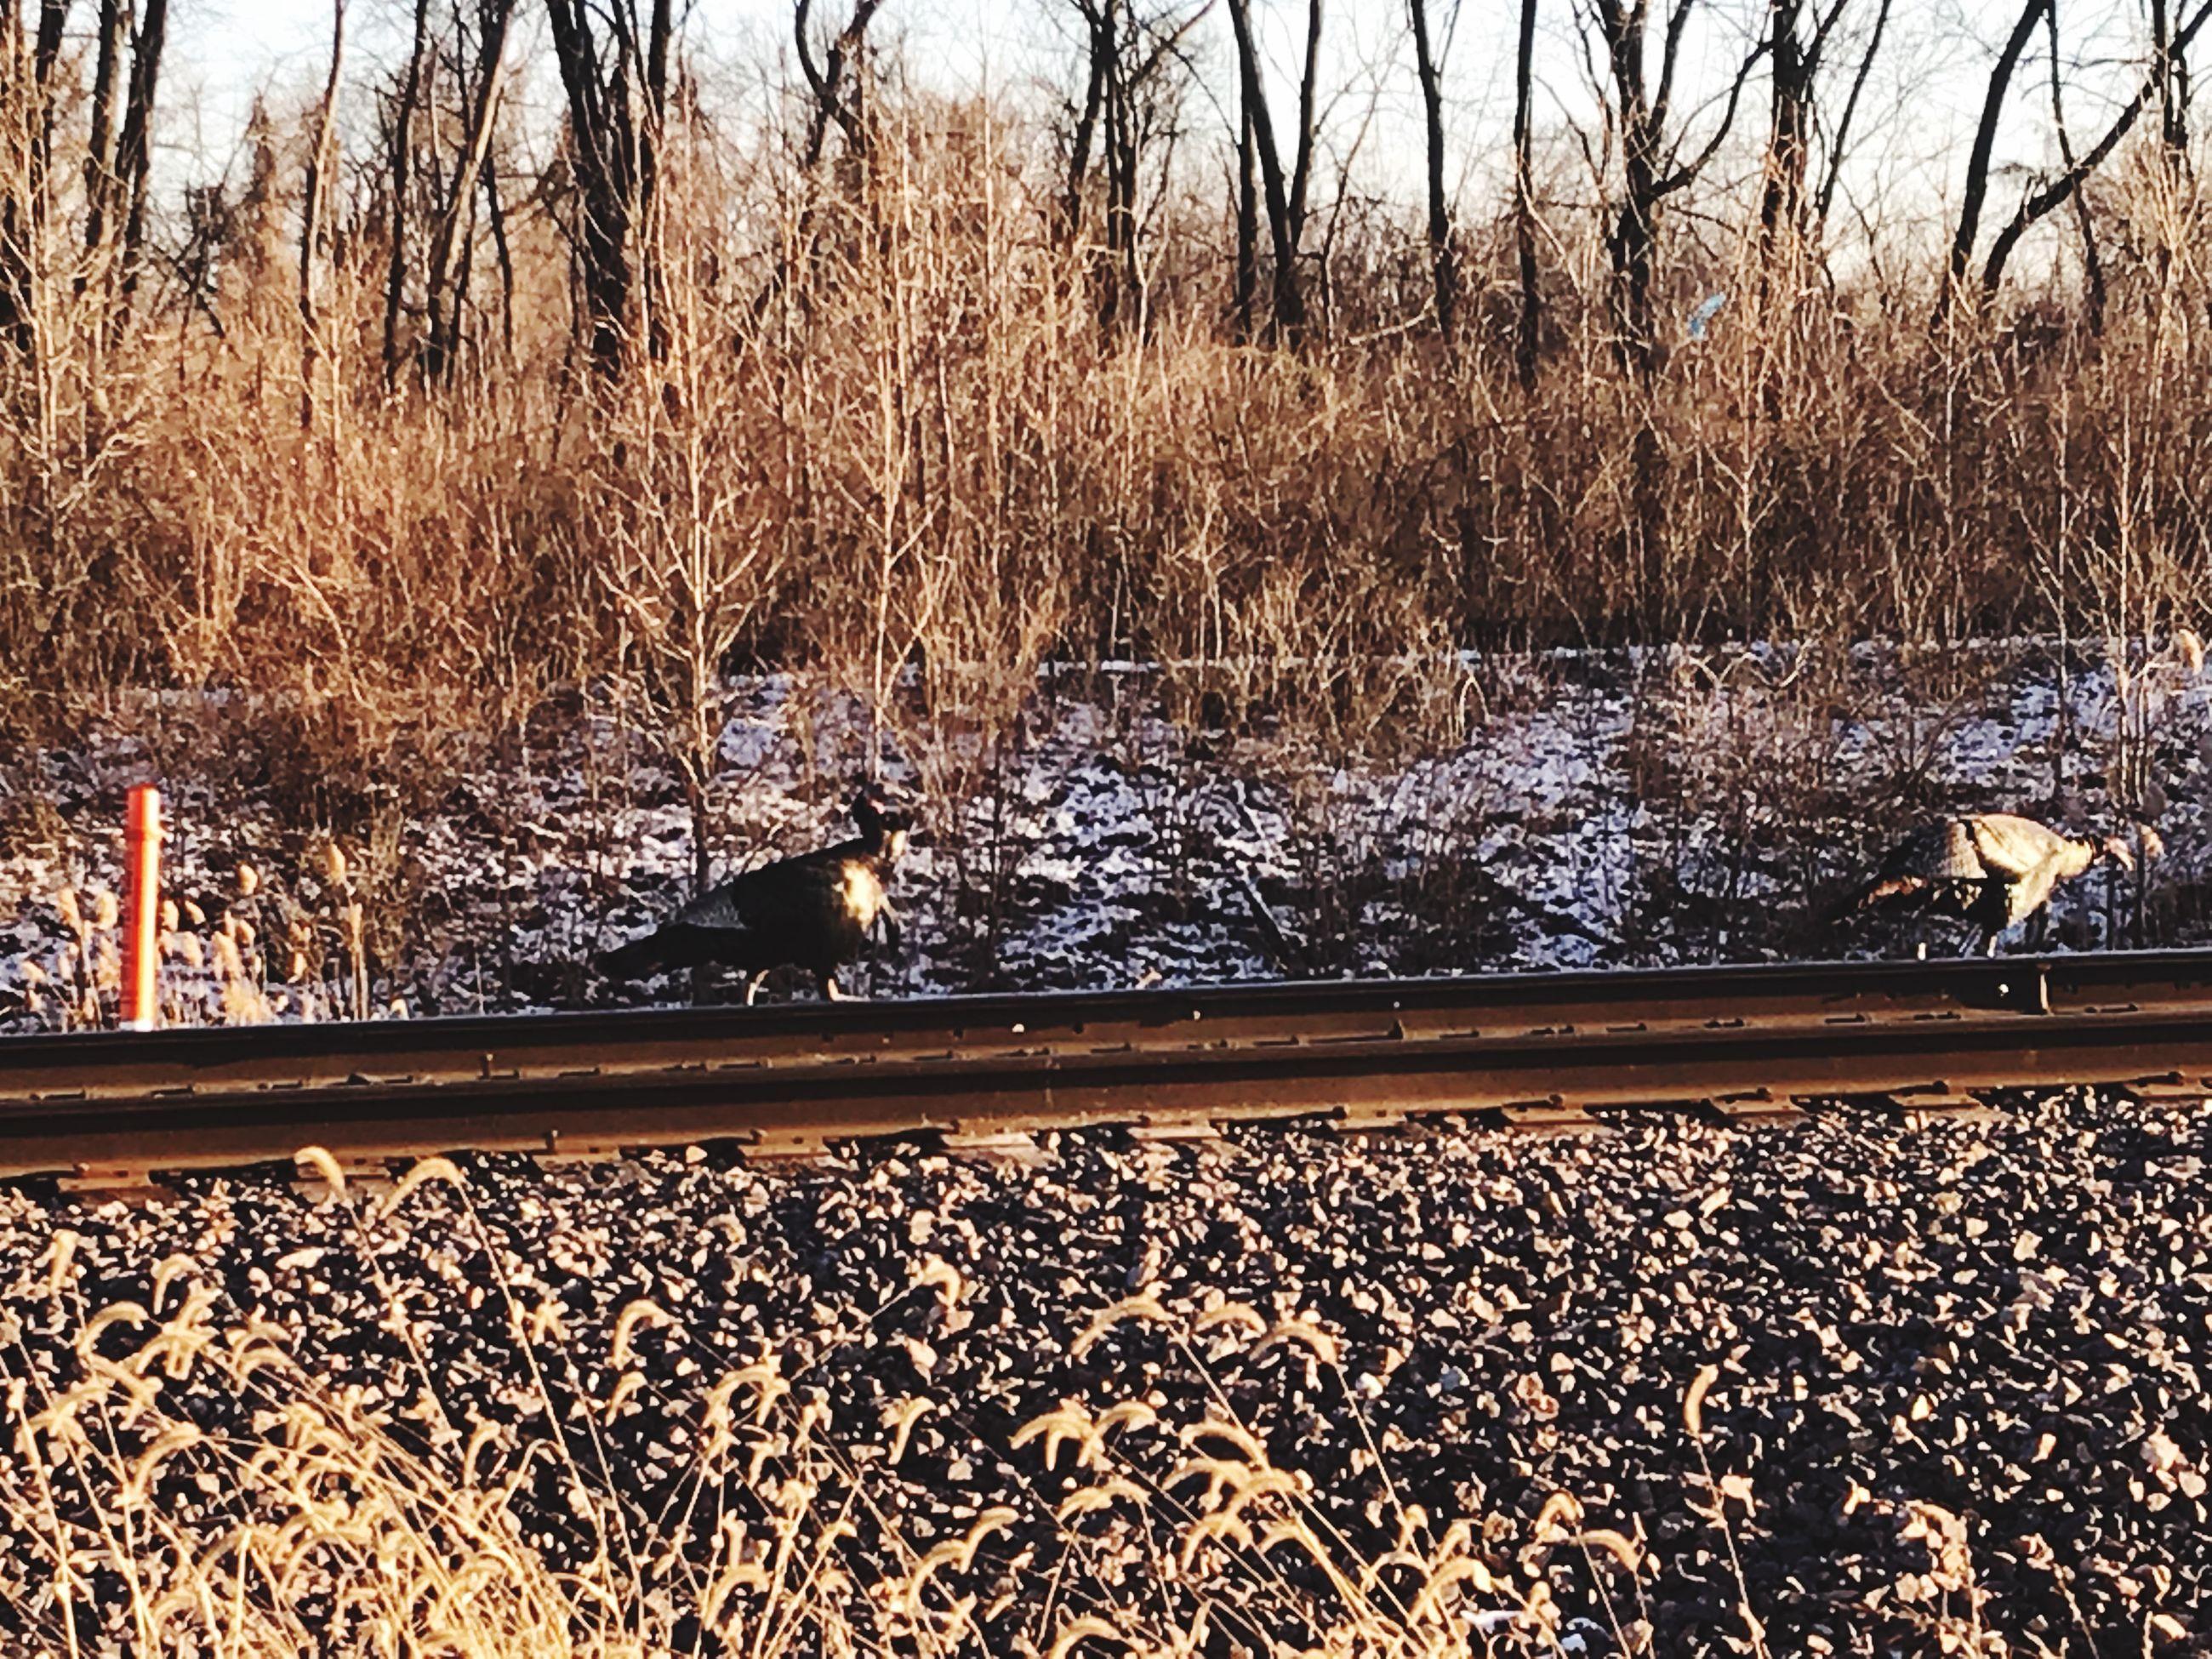 railroad track, transportation, rail transportation, outdoors, nature, no people, tree, day, motion, animal themes, bird